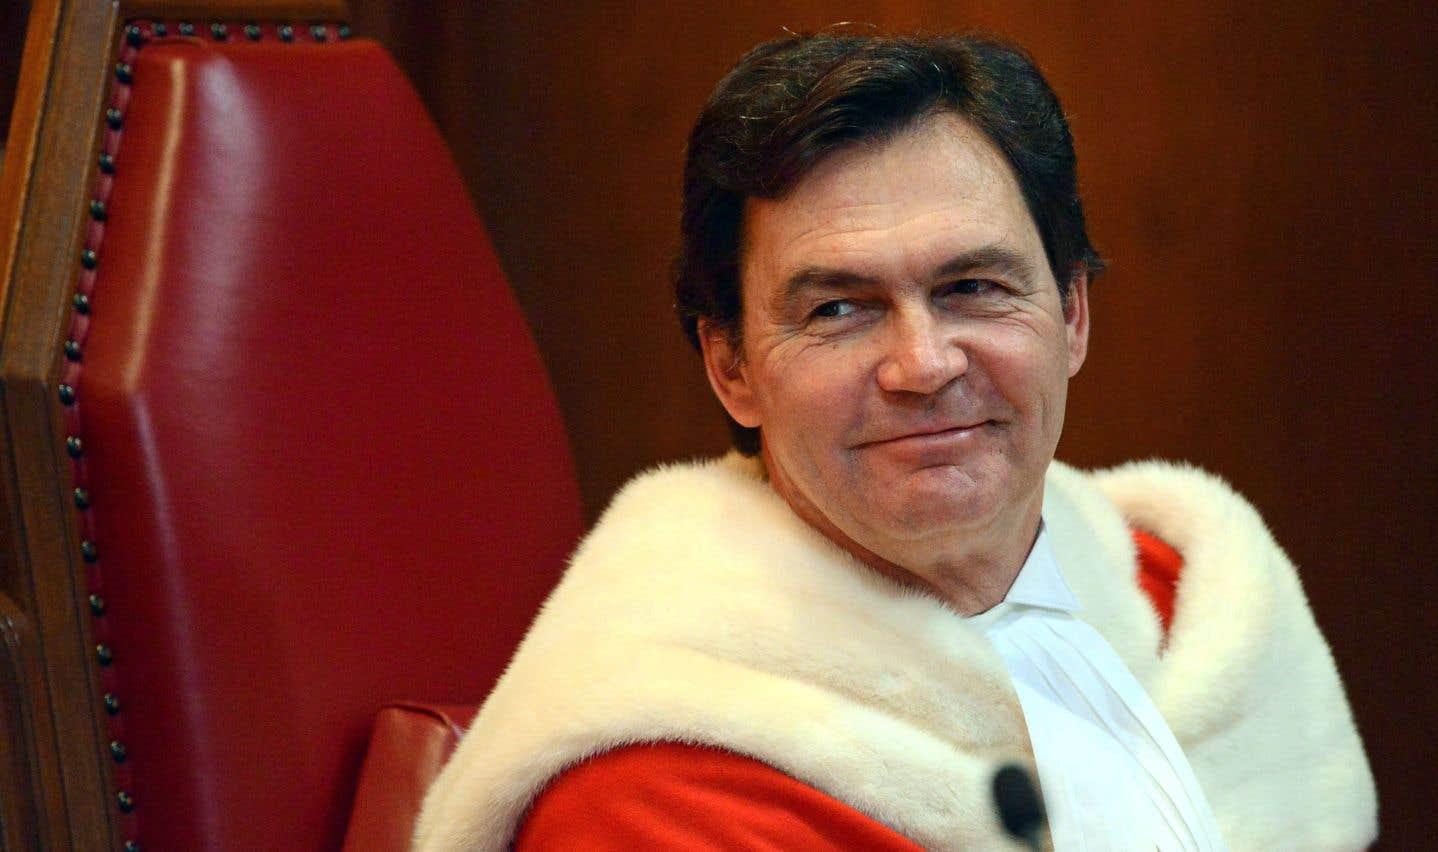 Prochain juge en chef: Richard Wagner part favori